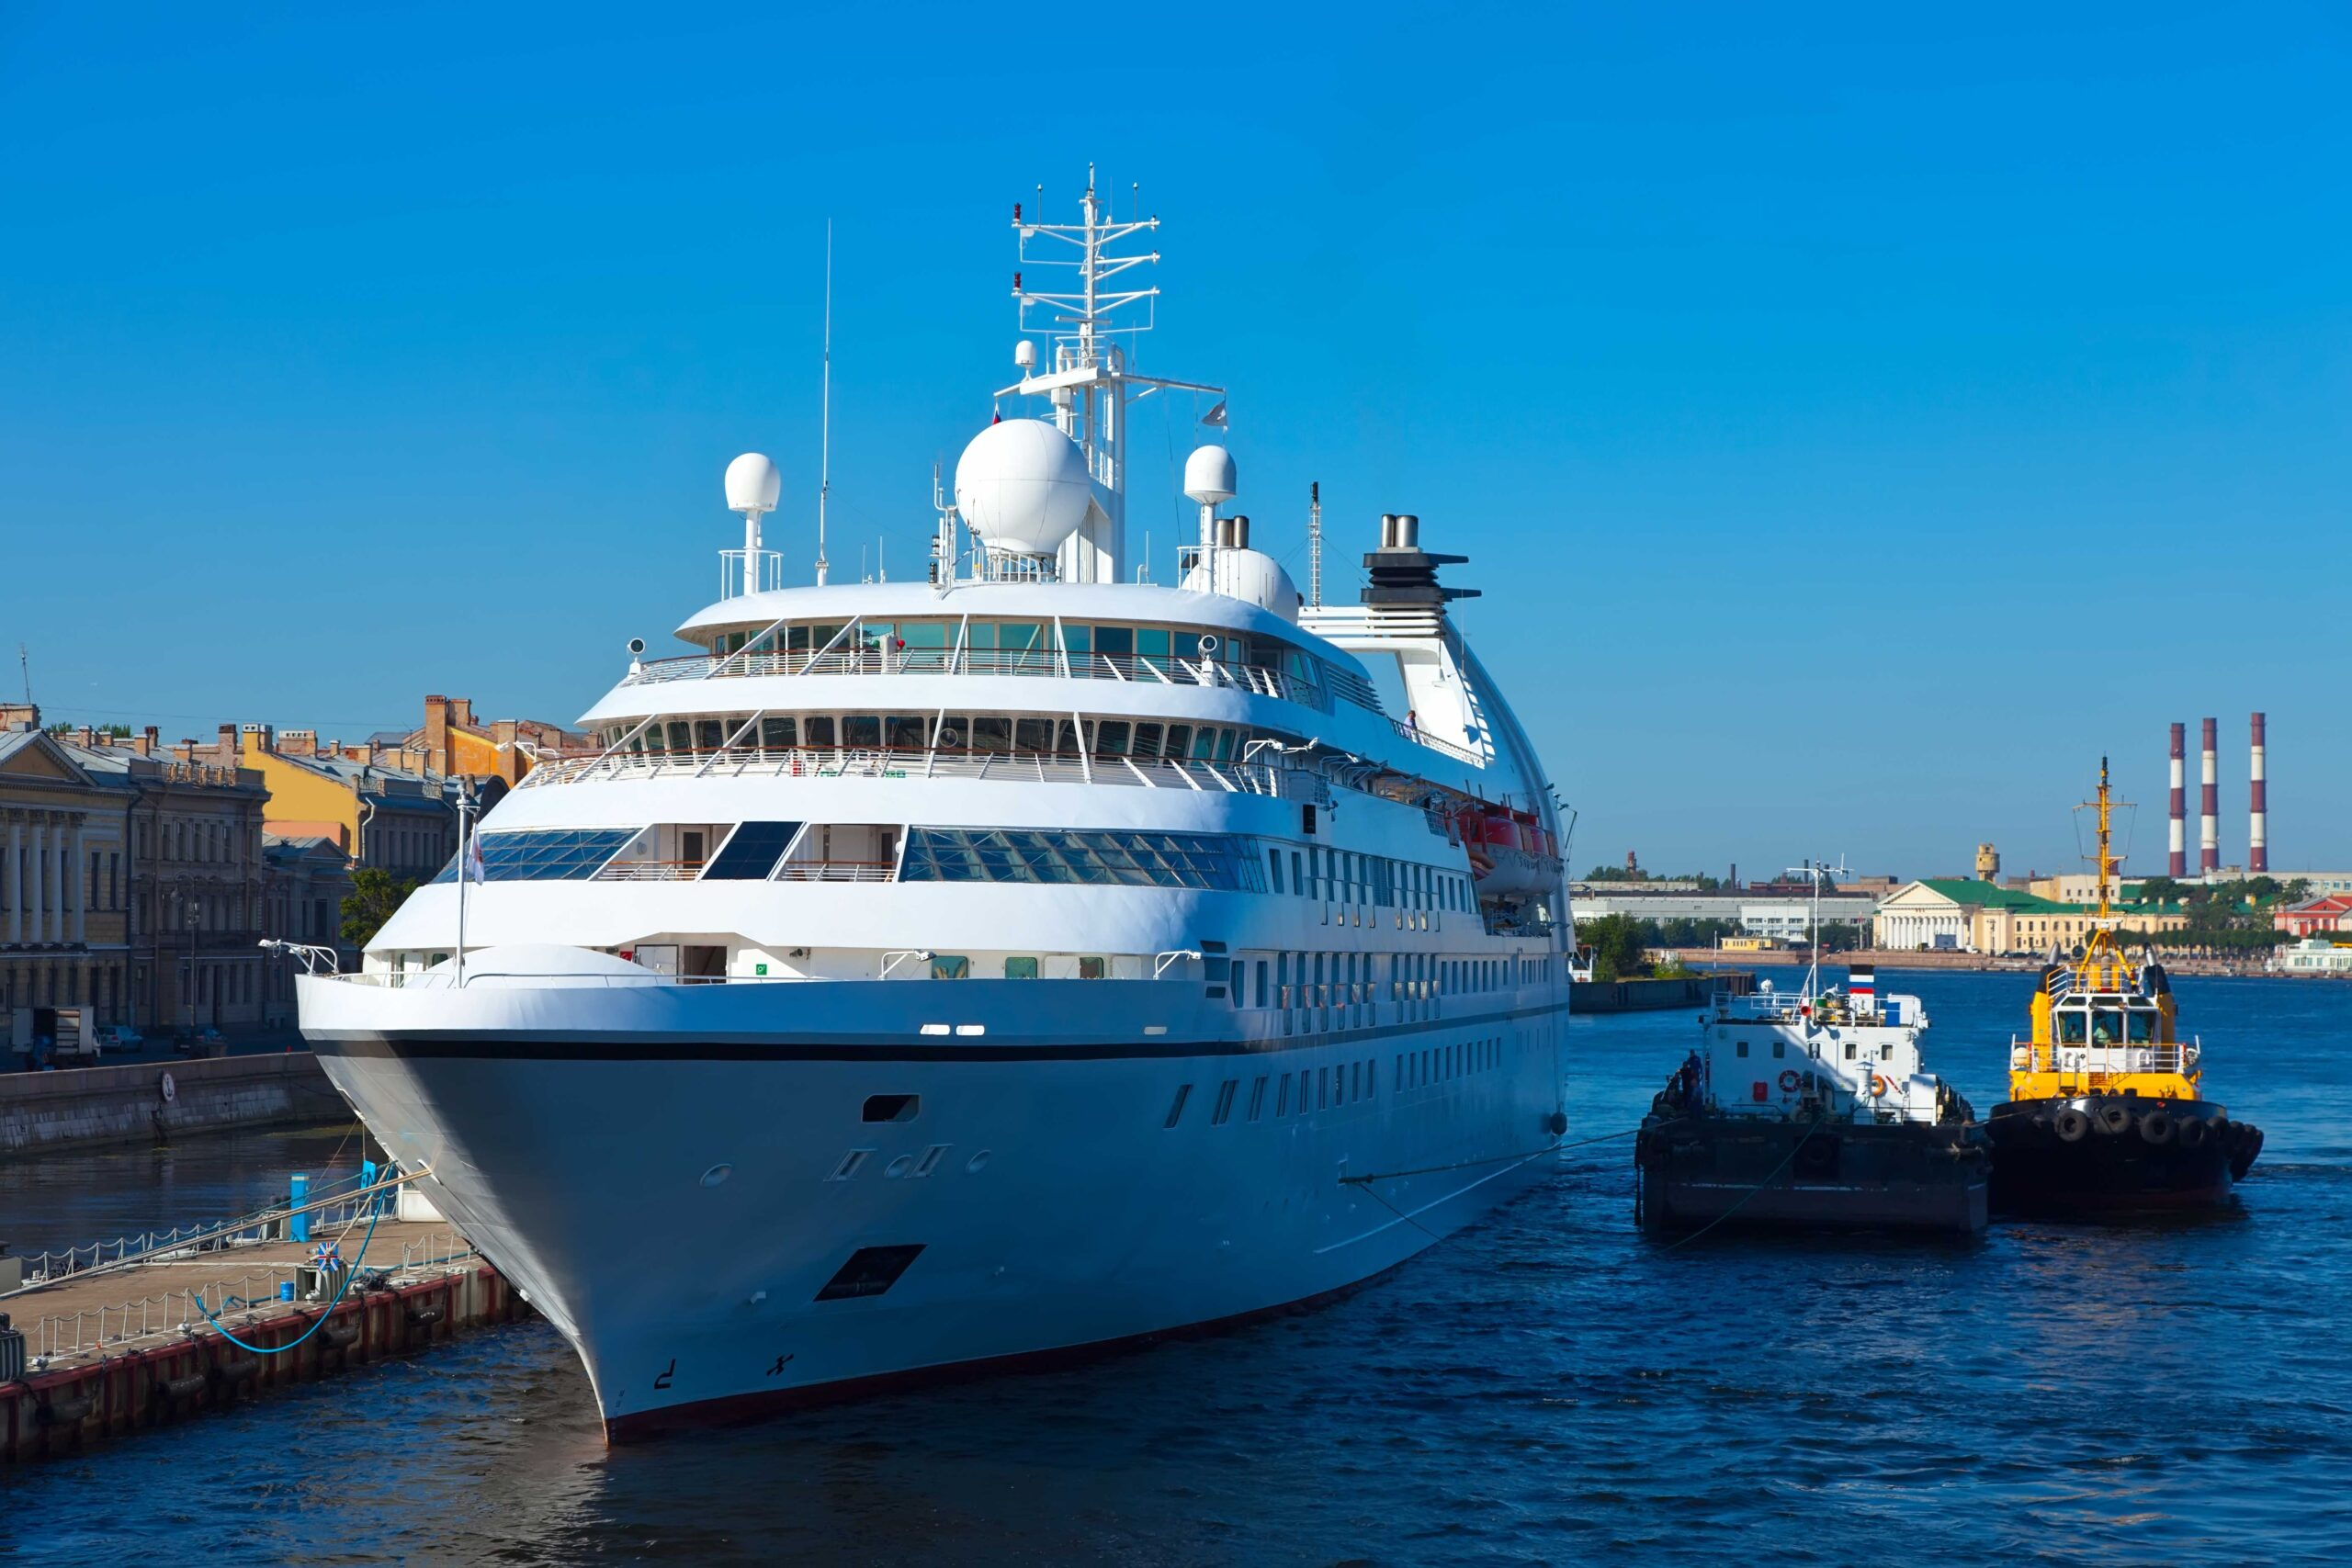 white-cruise-ship-southampton-transfers-scaled-1.jpg